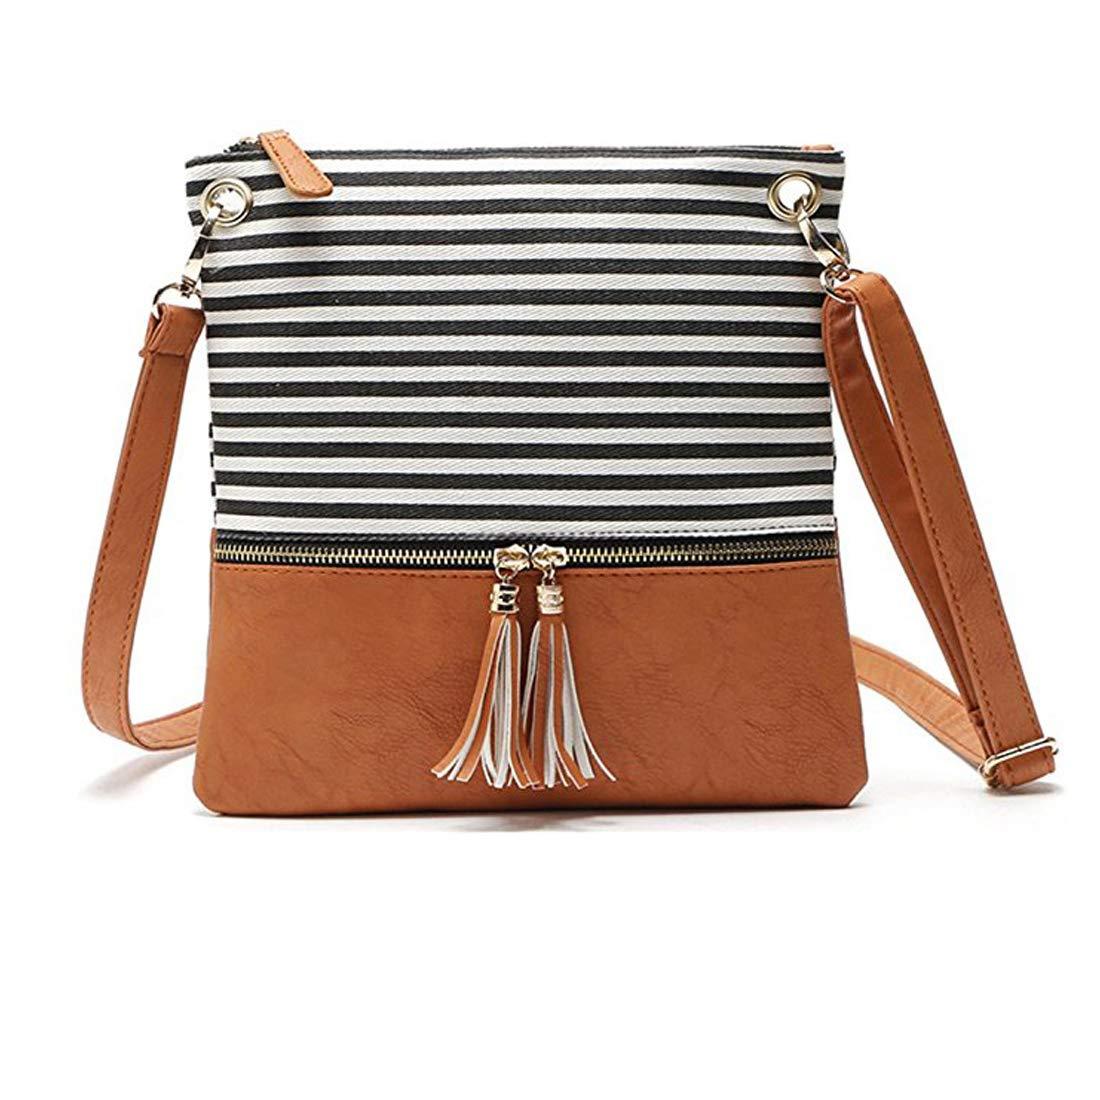 Crossbody Shoulder Bag,Messenger Bag Handbag with Double Zipper for Women Lady Girls by Ubags (Black Stripe) by Ubags (Image #1)